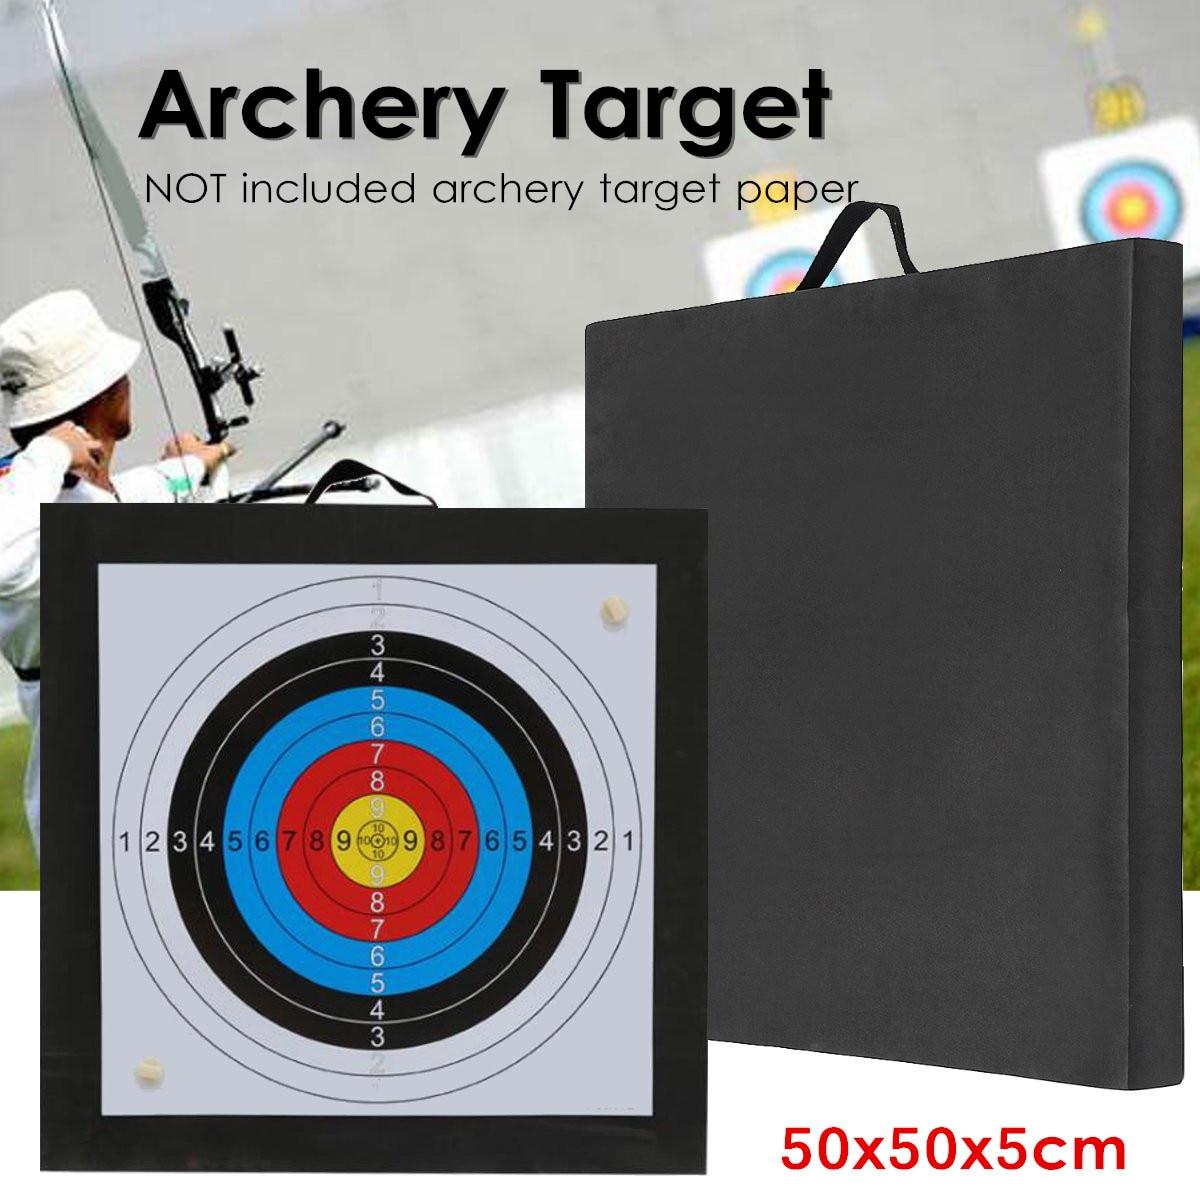 Archery Target High Density EVA Foam Shooting Practice Board Outdoor Sport Hunting Accessories RecurveCrossbow 50x50x5cm Black